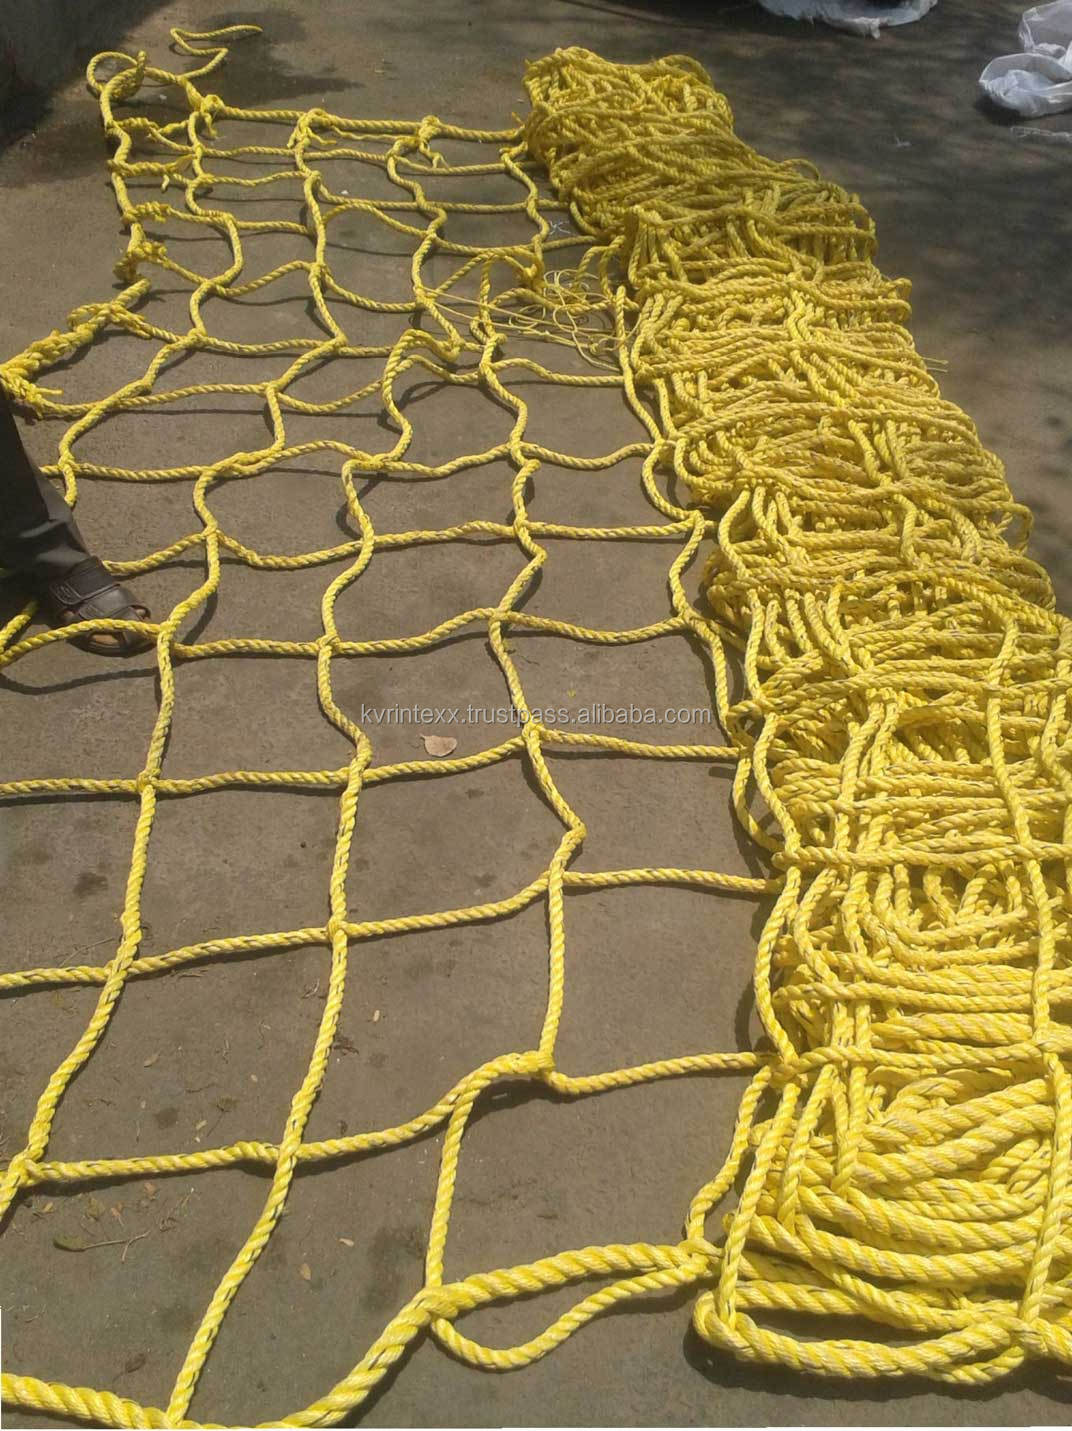 Плетение сетки из веревки своими руками фото